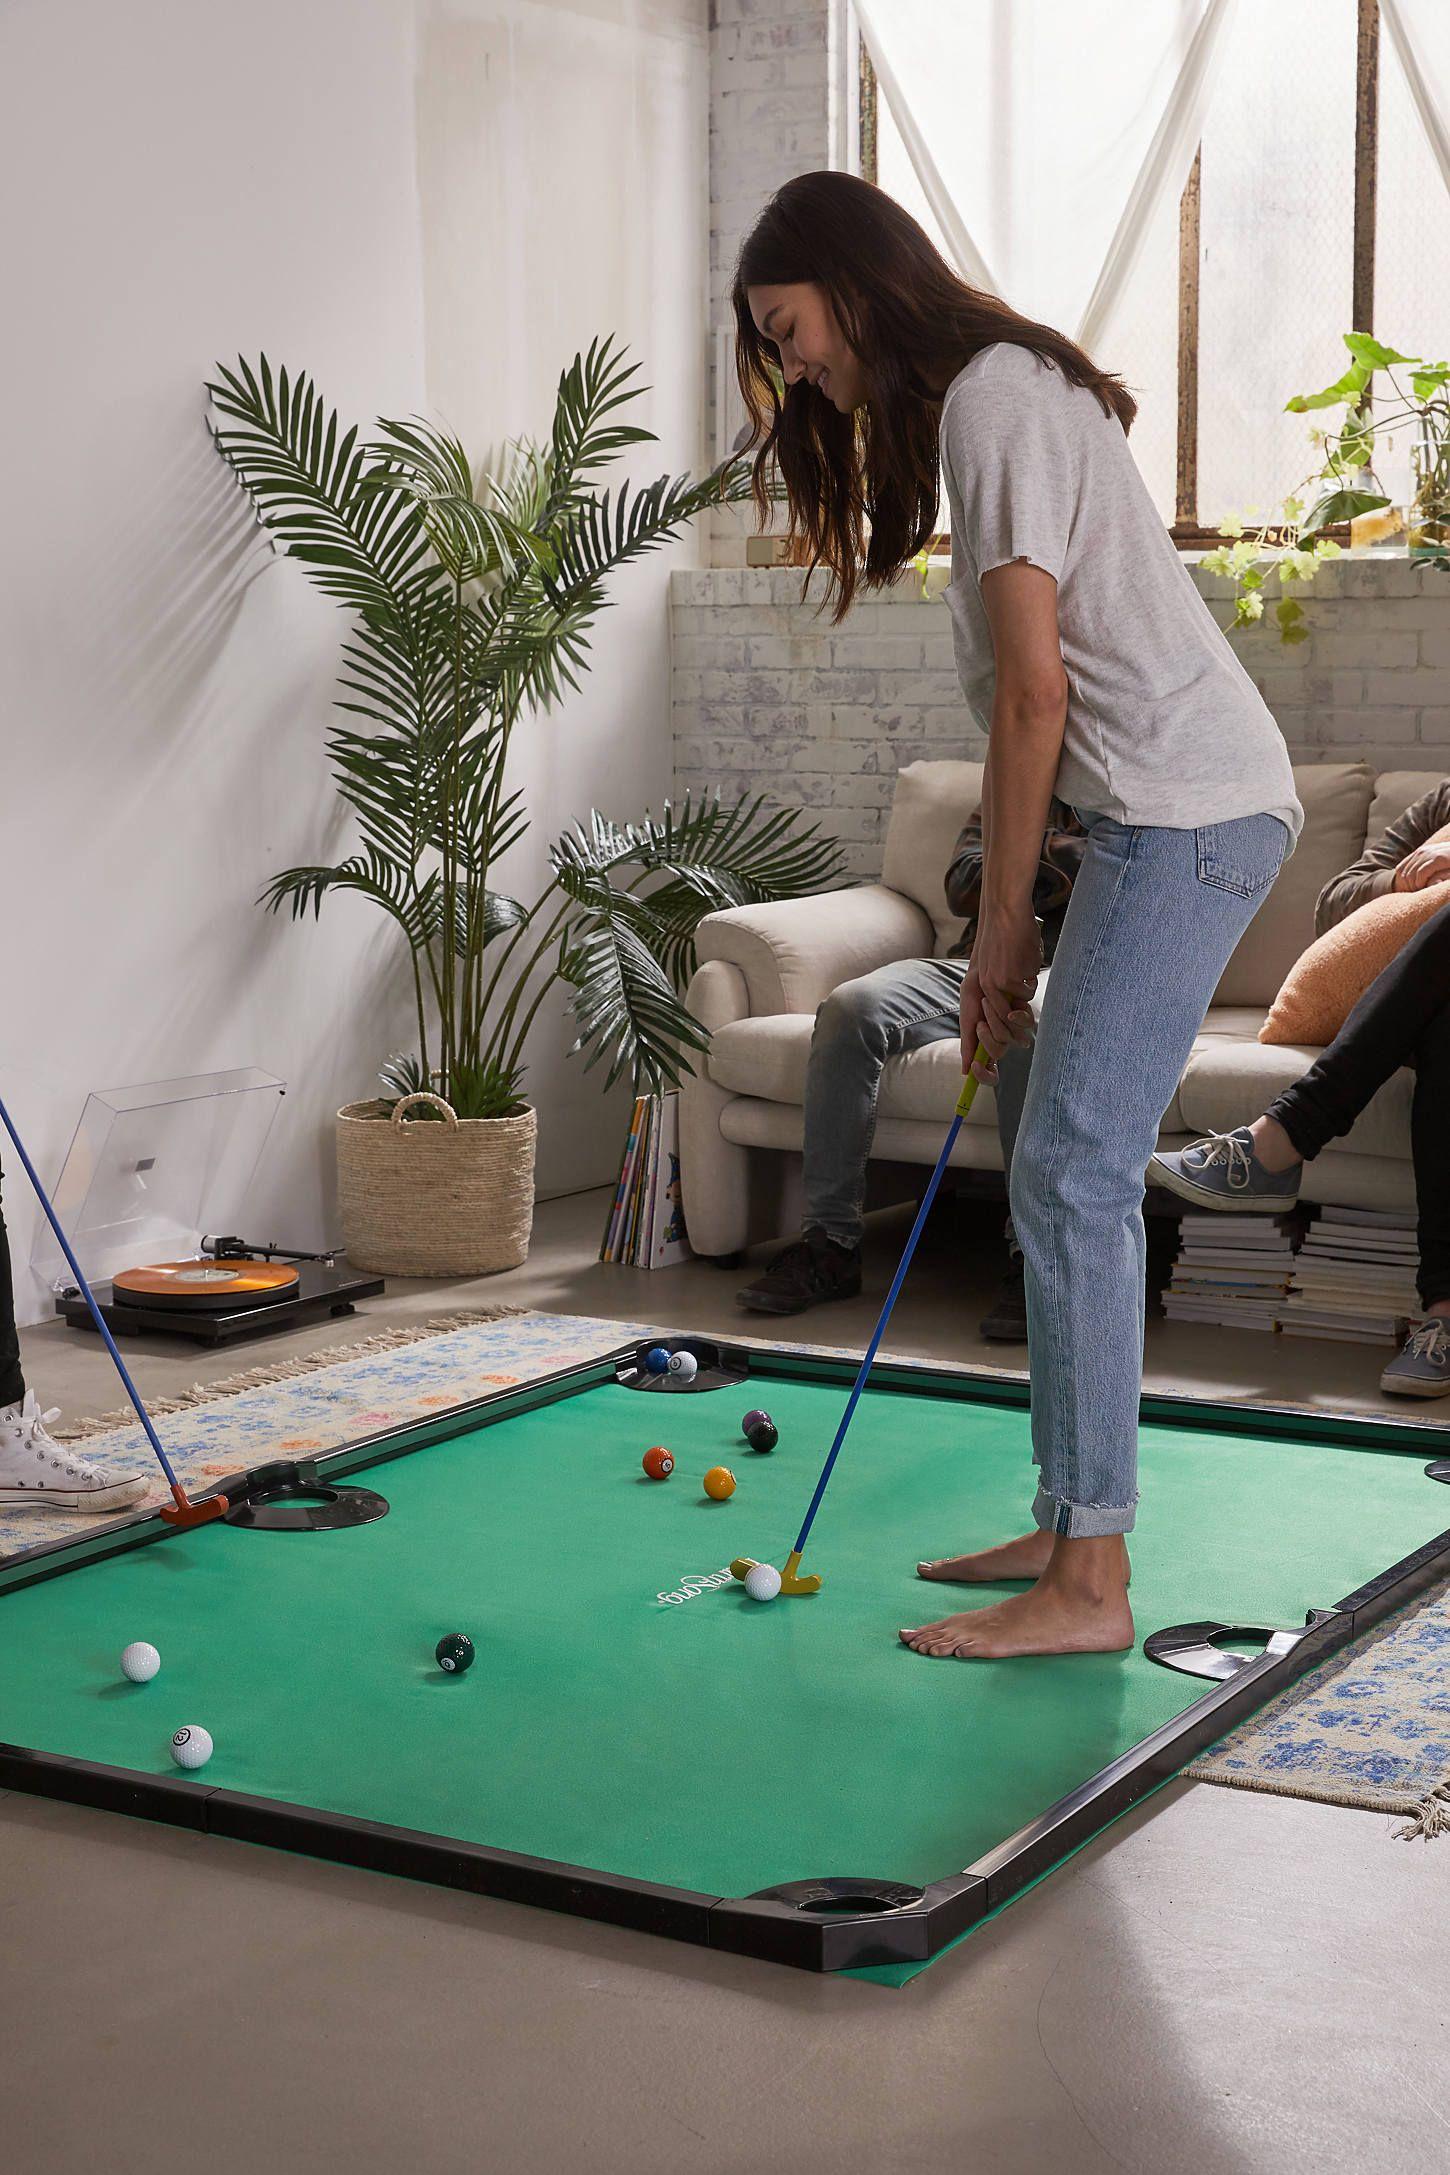 Mini Golf Pool in 2020 Mini golf, Diy yard games